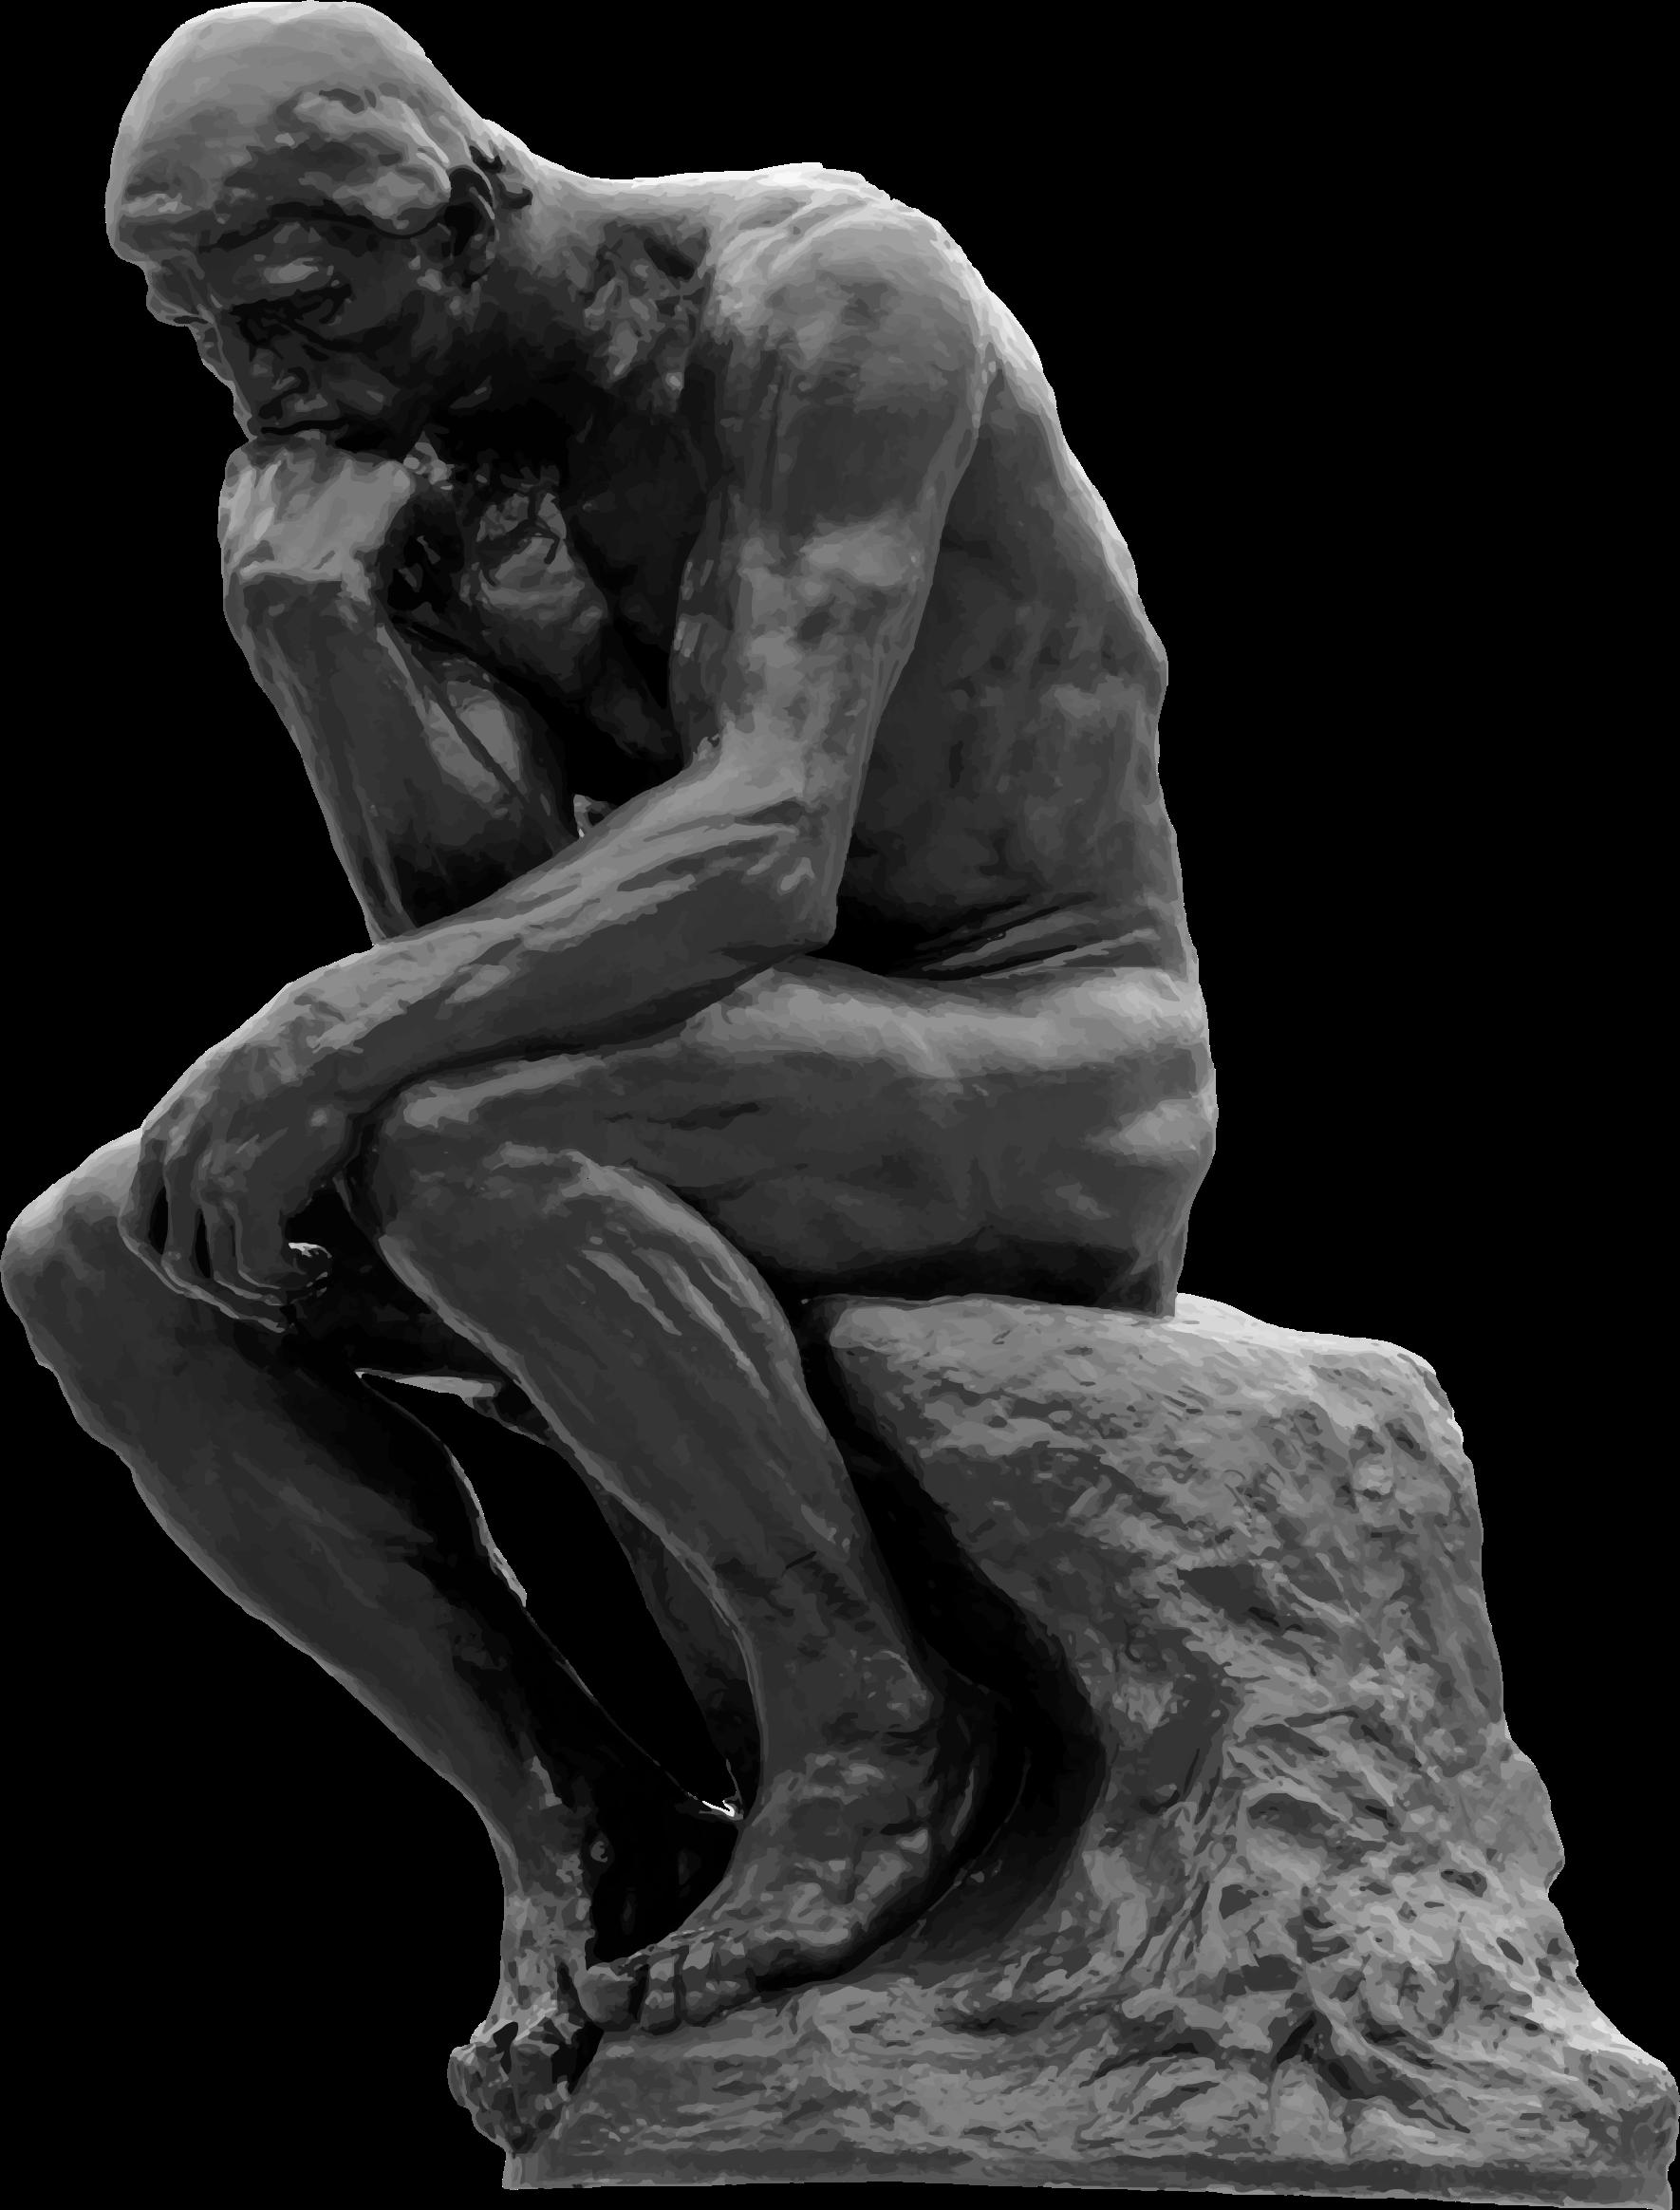 The Thinker Auguste Rodin Grayscale Png 1770 2328 Velikoe Iskusstvo Impressionist Myslitel